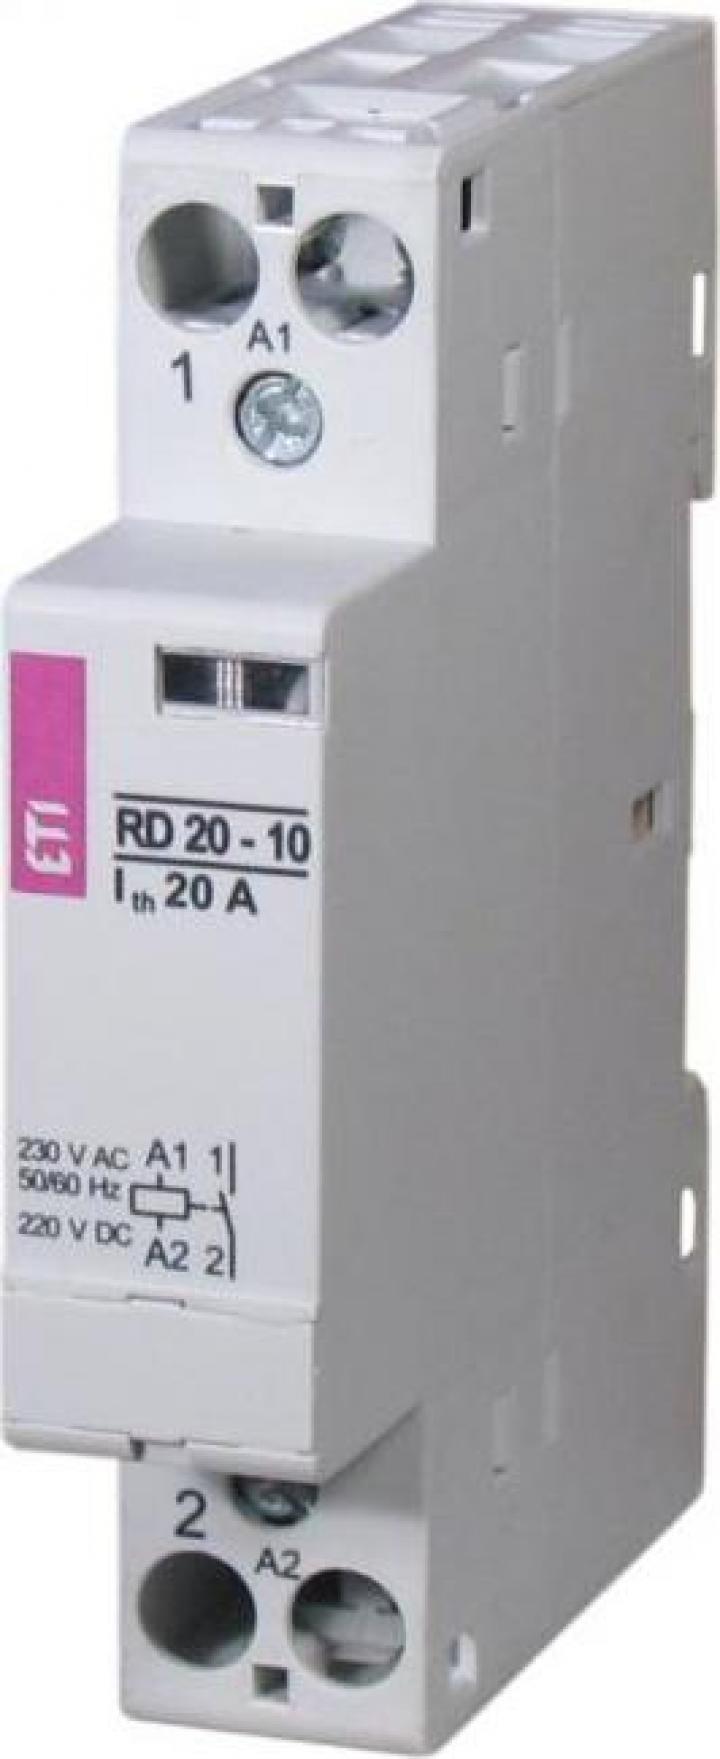 Contactor modular RBS225-10-24V AC ETI